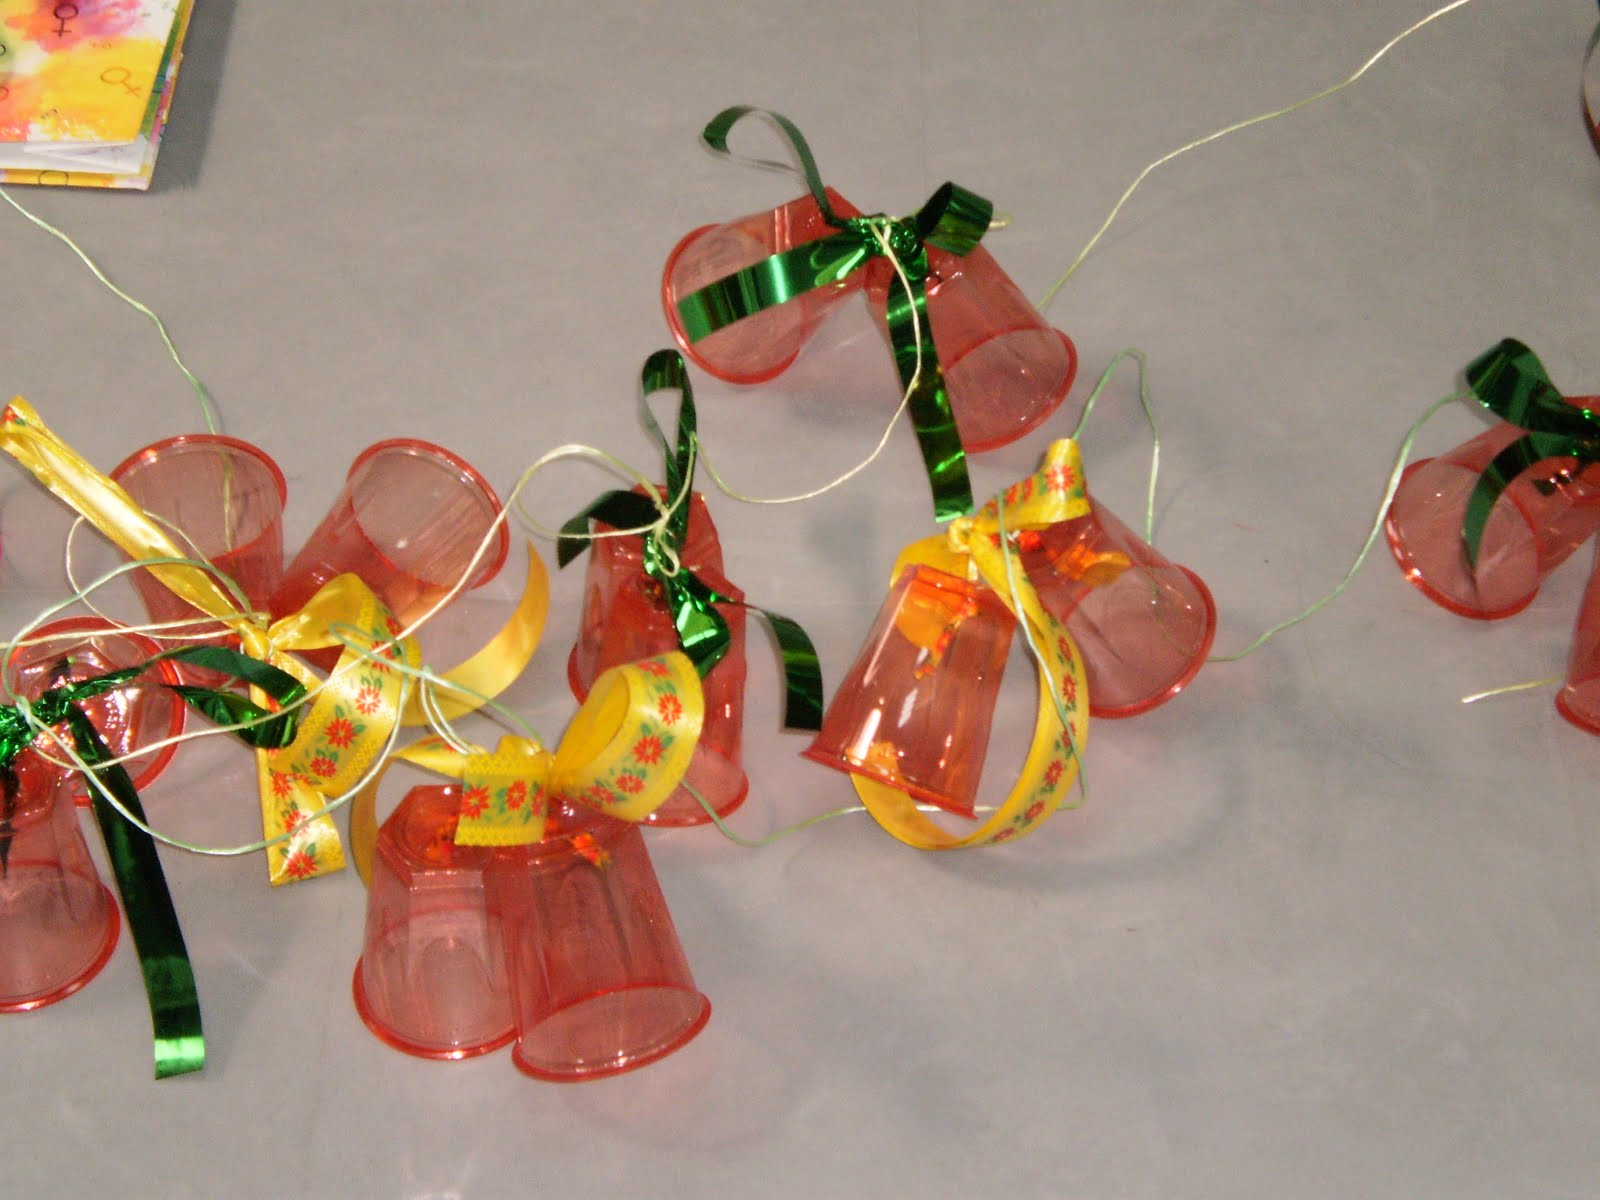 Adornos navide os reciclados - Adornos para navidad con pinas ...